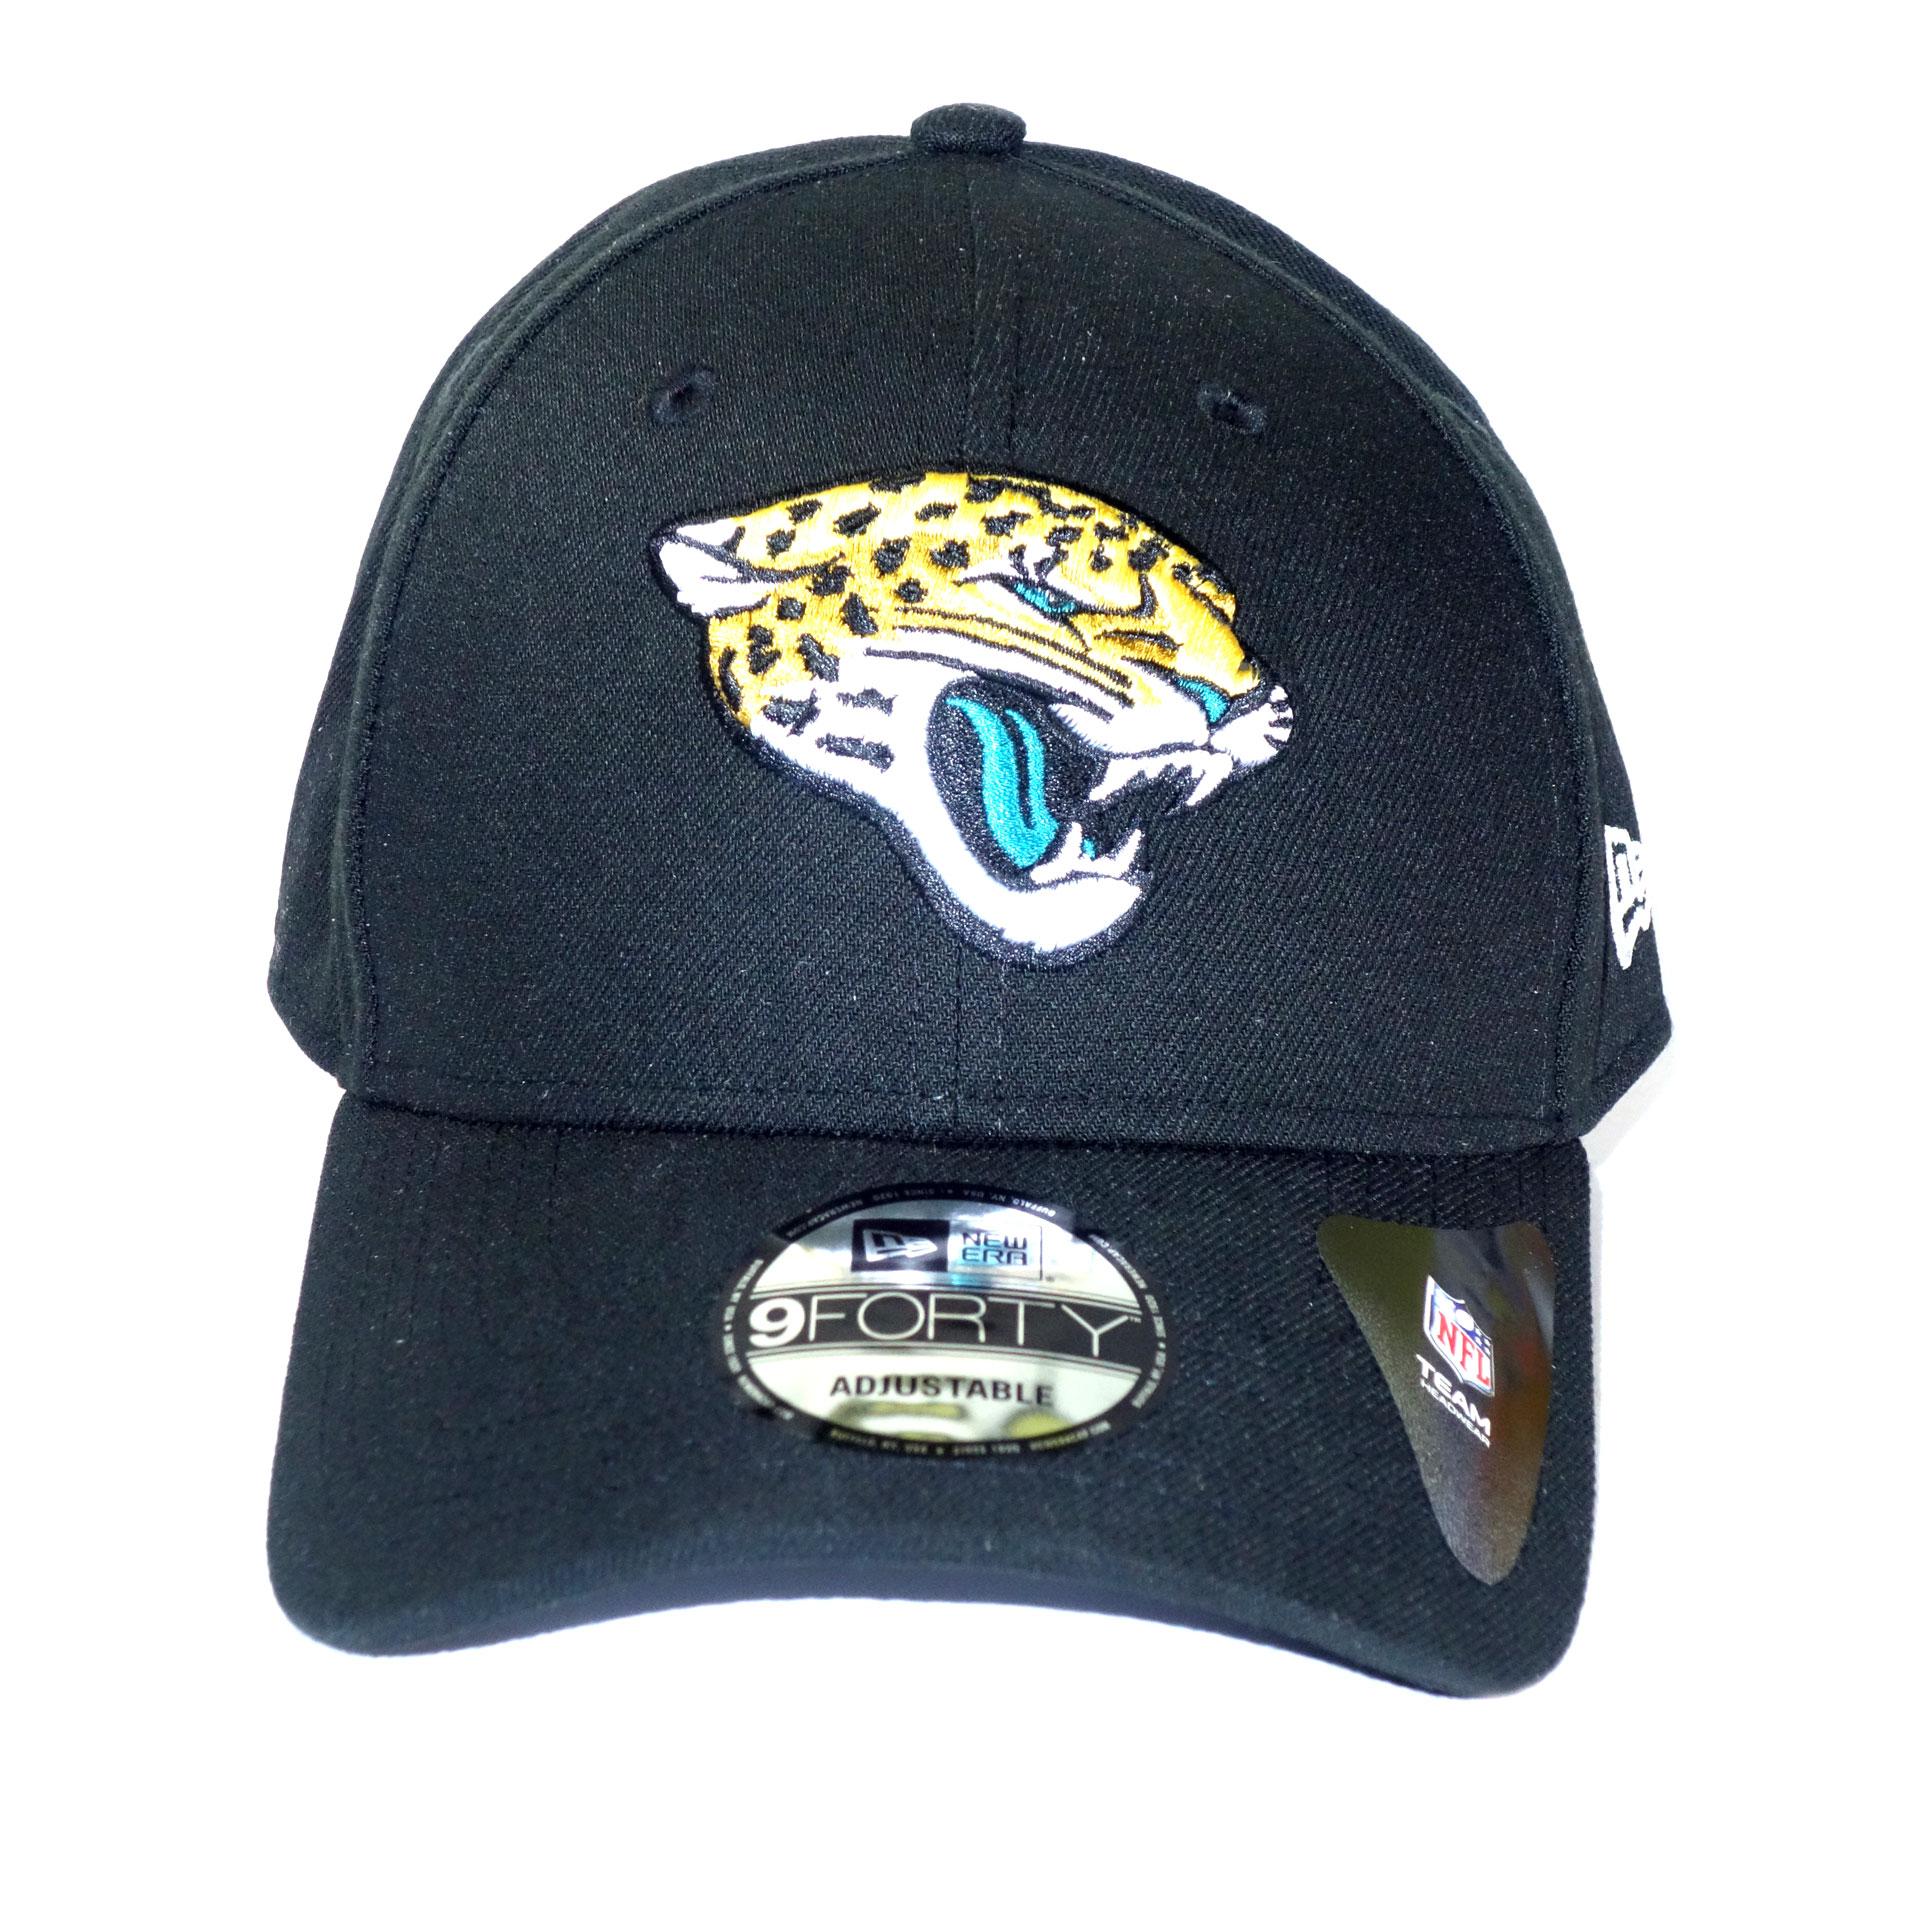 NFL New Era Cap Jacksonville Jaguars